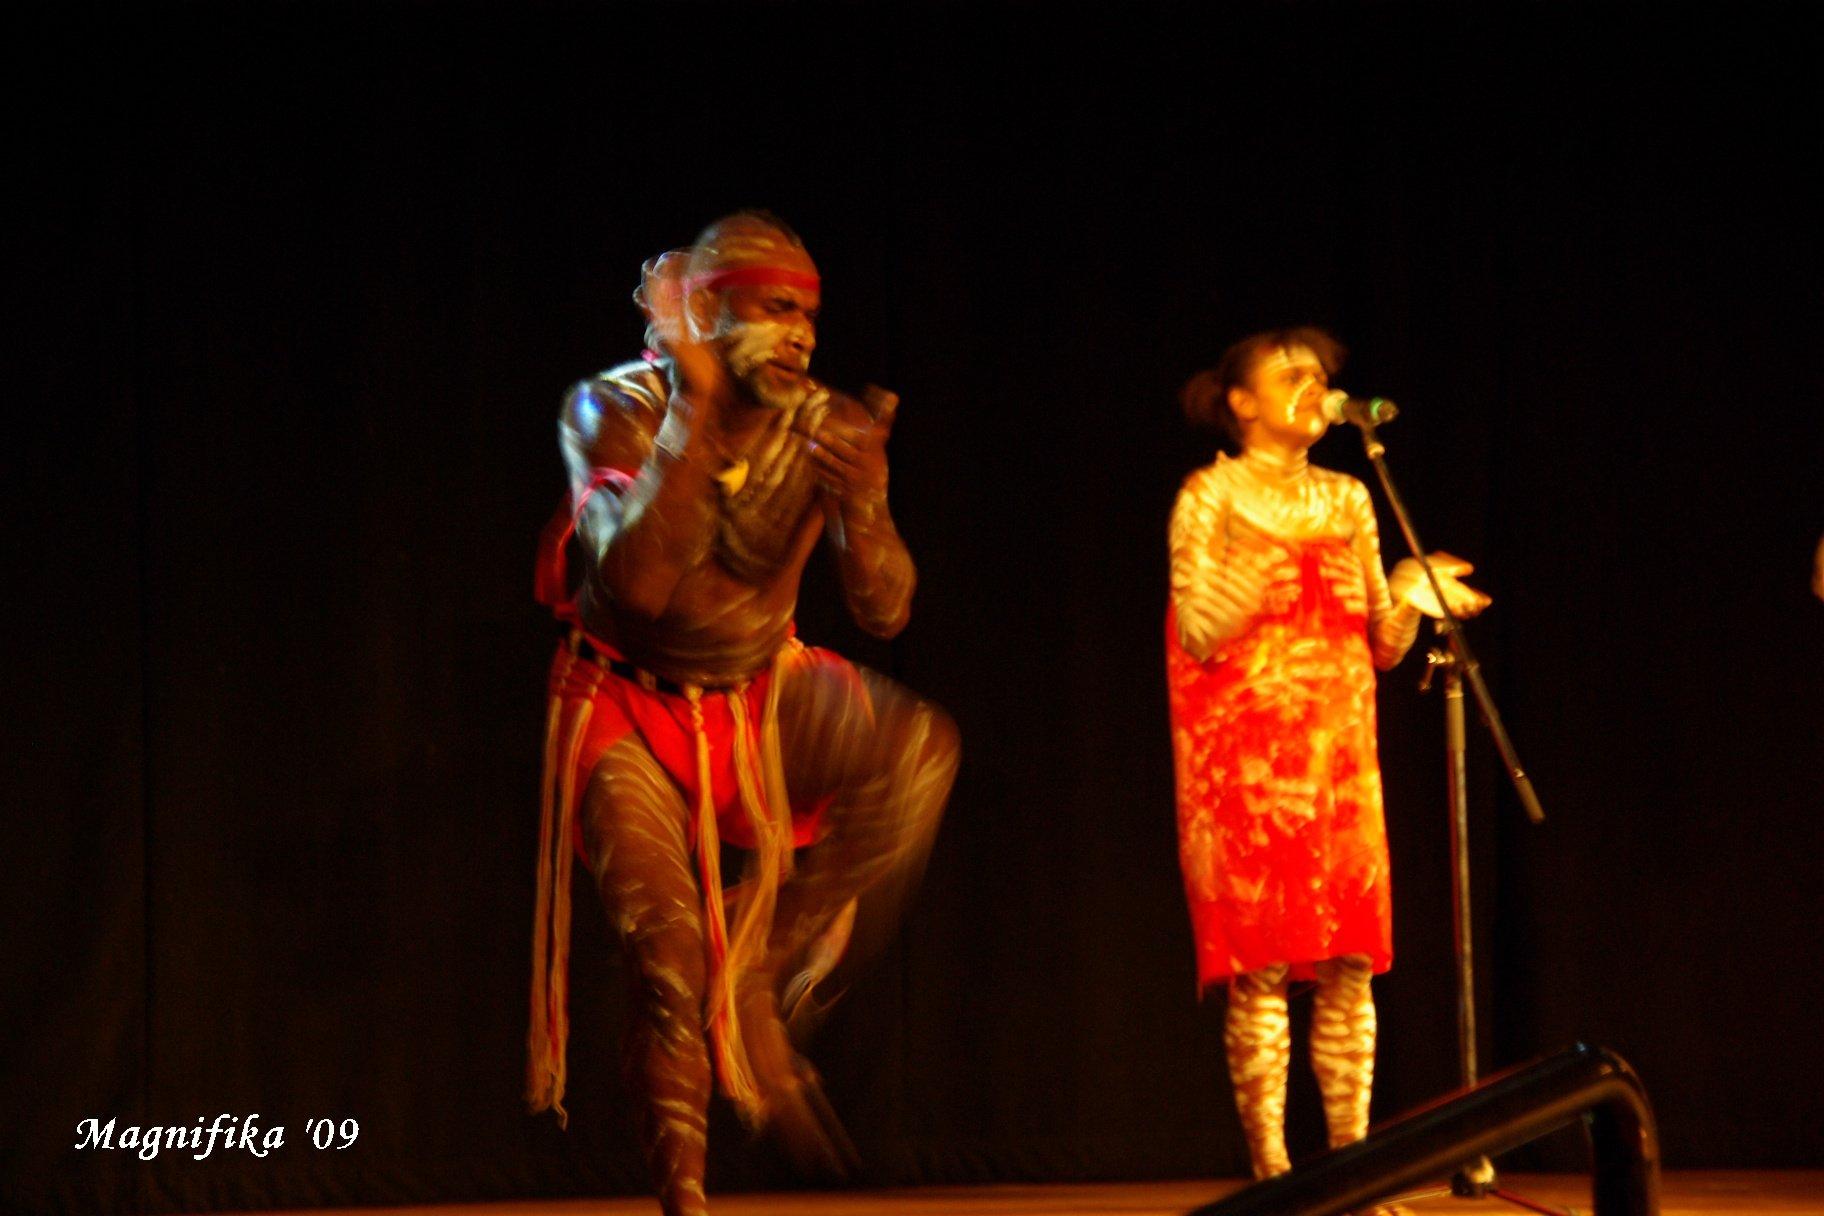 ASUKA II 南太平洋グランドクルーズ2009-25 アボリジニのショー Aboriginals Performance_e0140365_22191045.jpg